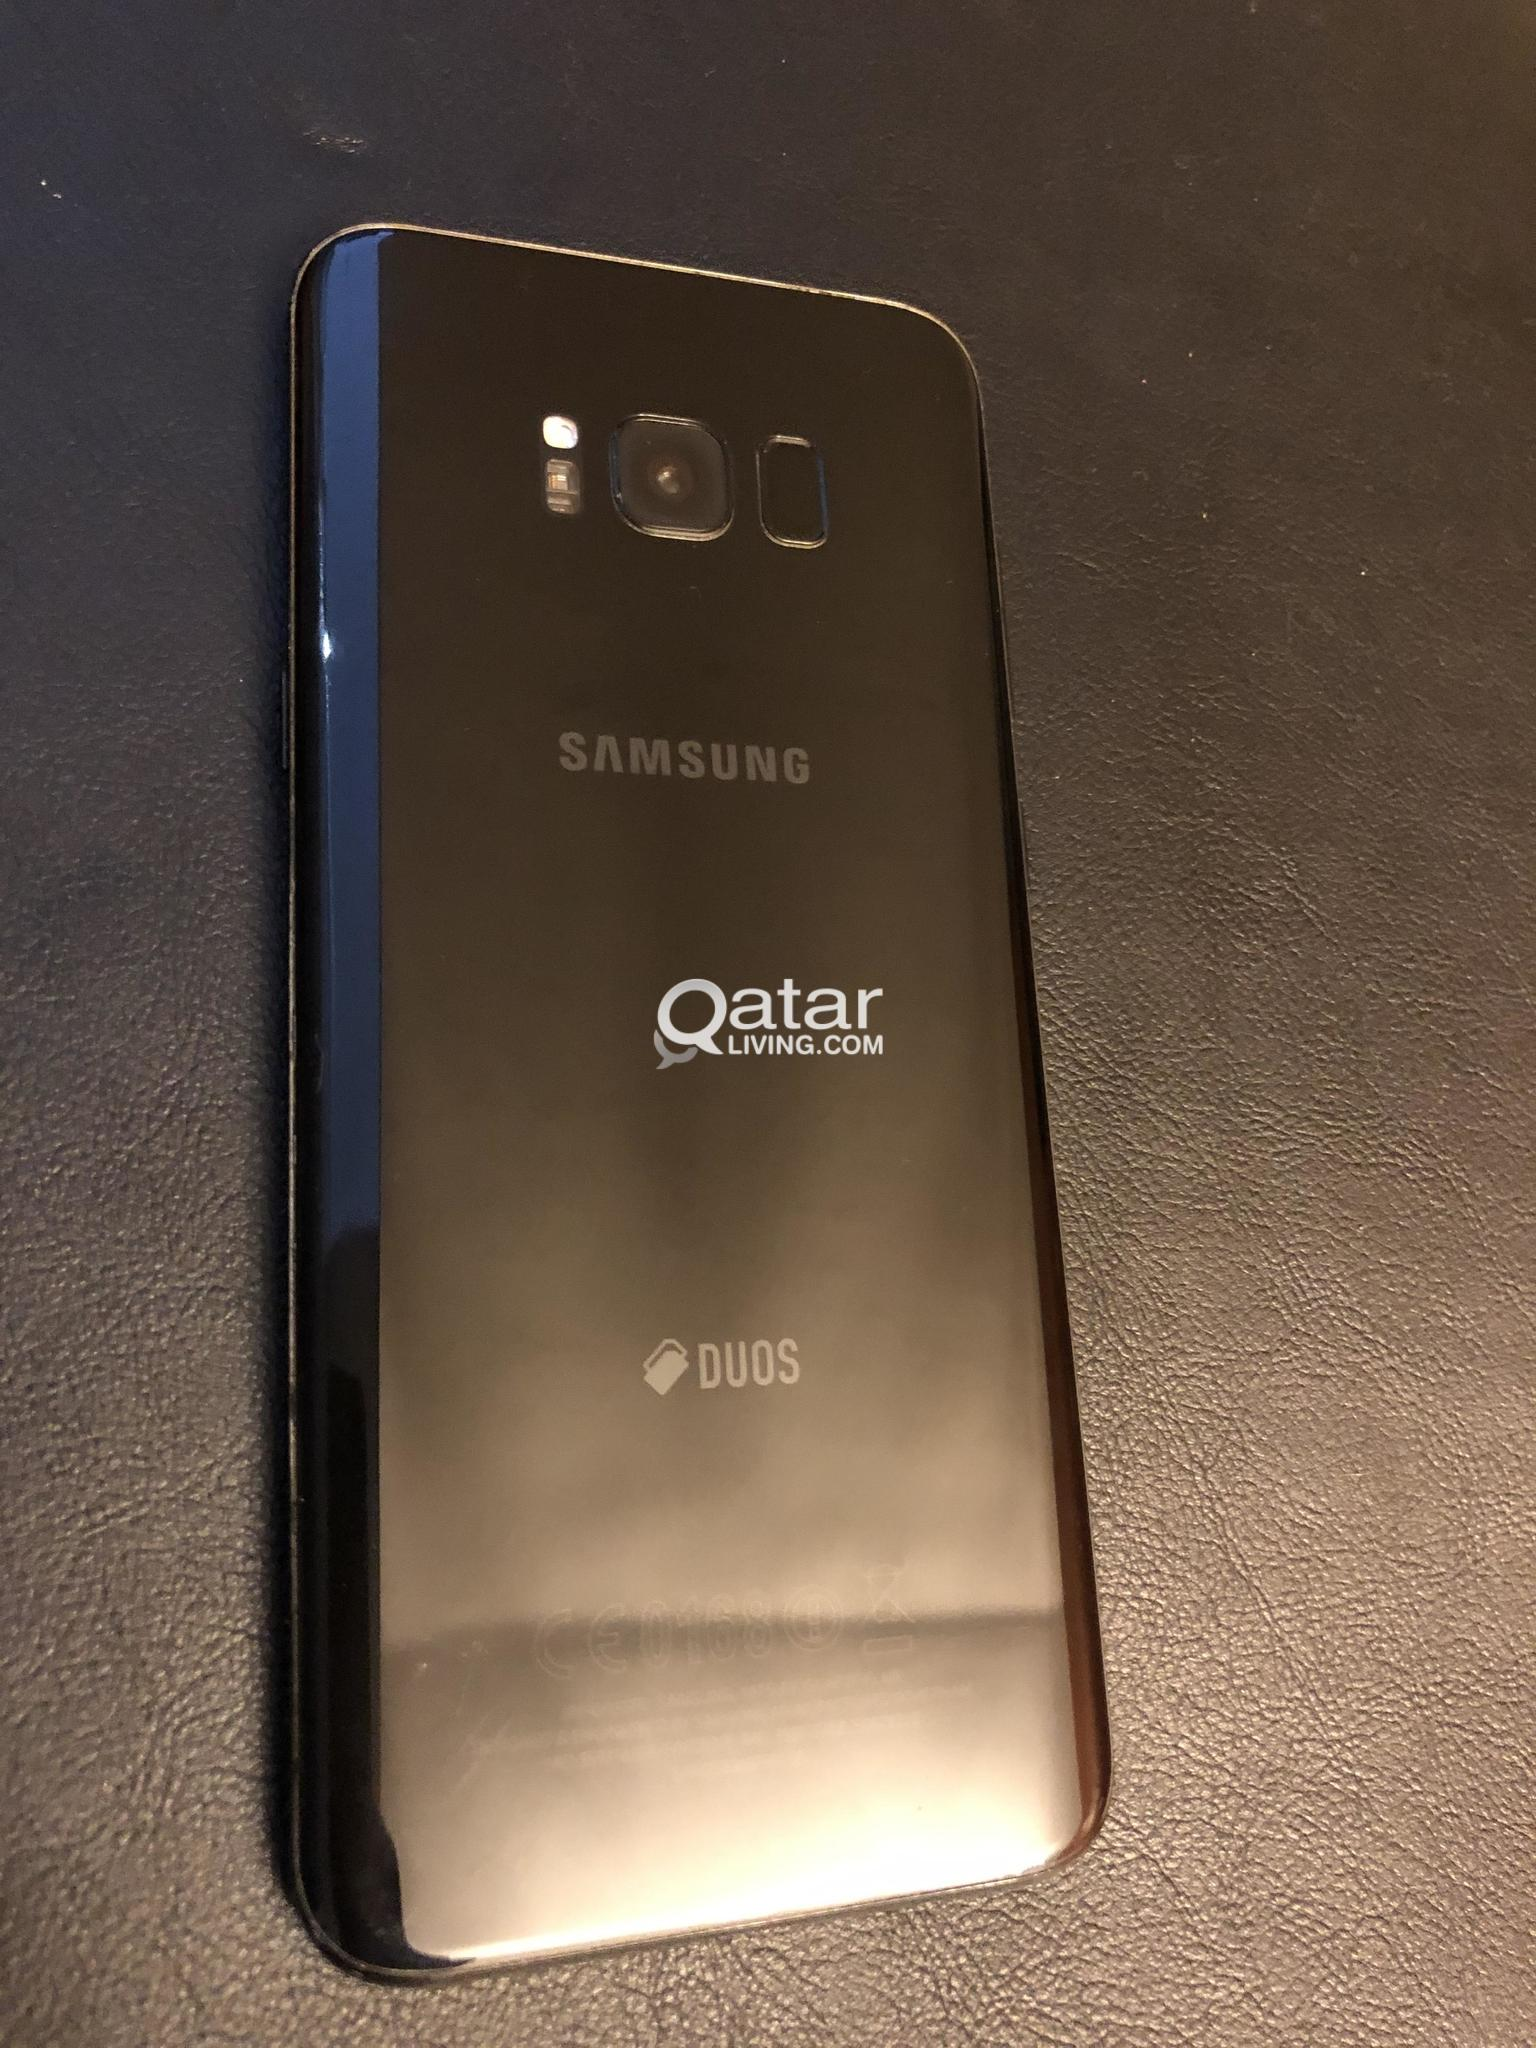 Samsung Galaxy S8+ W/ VR headset